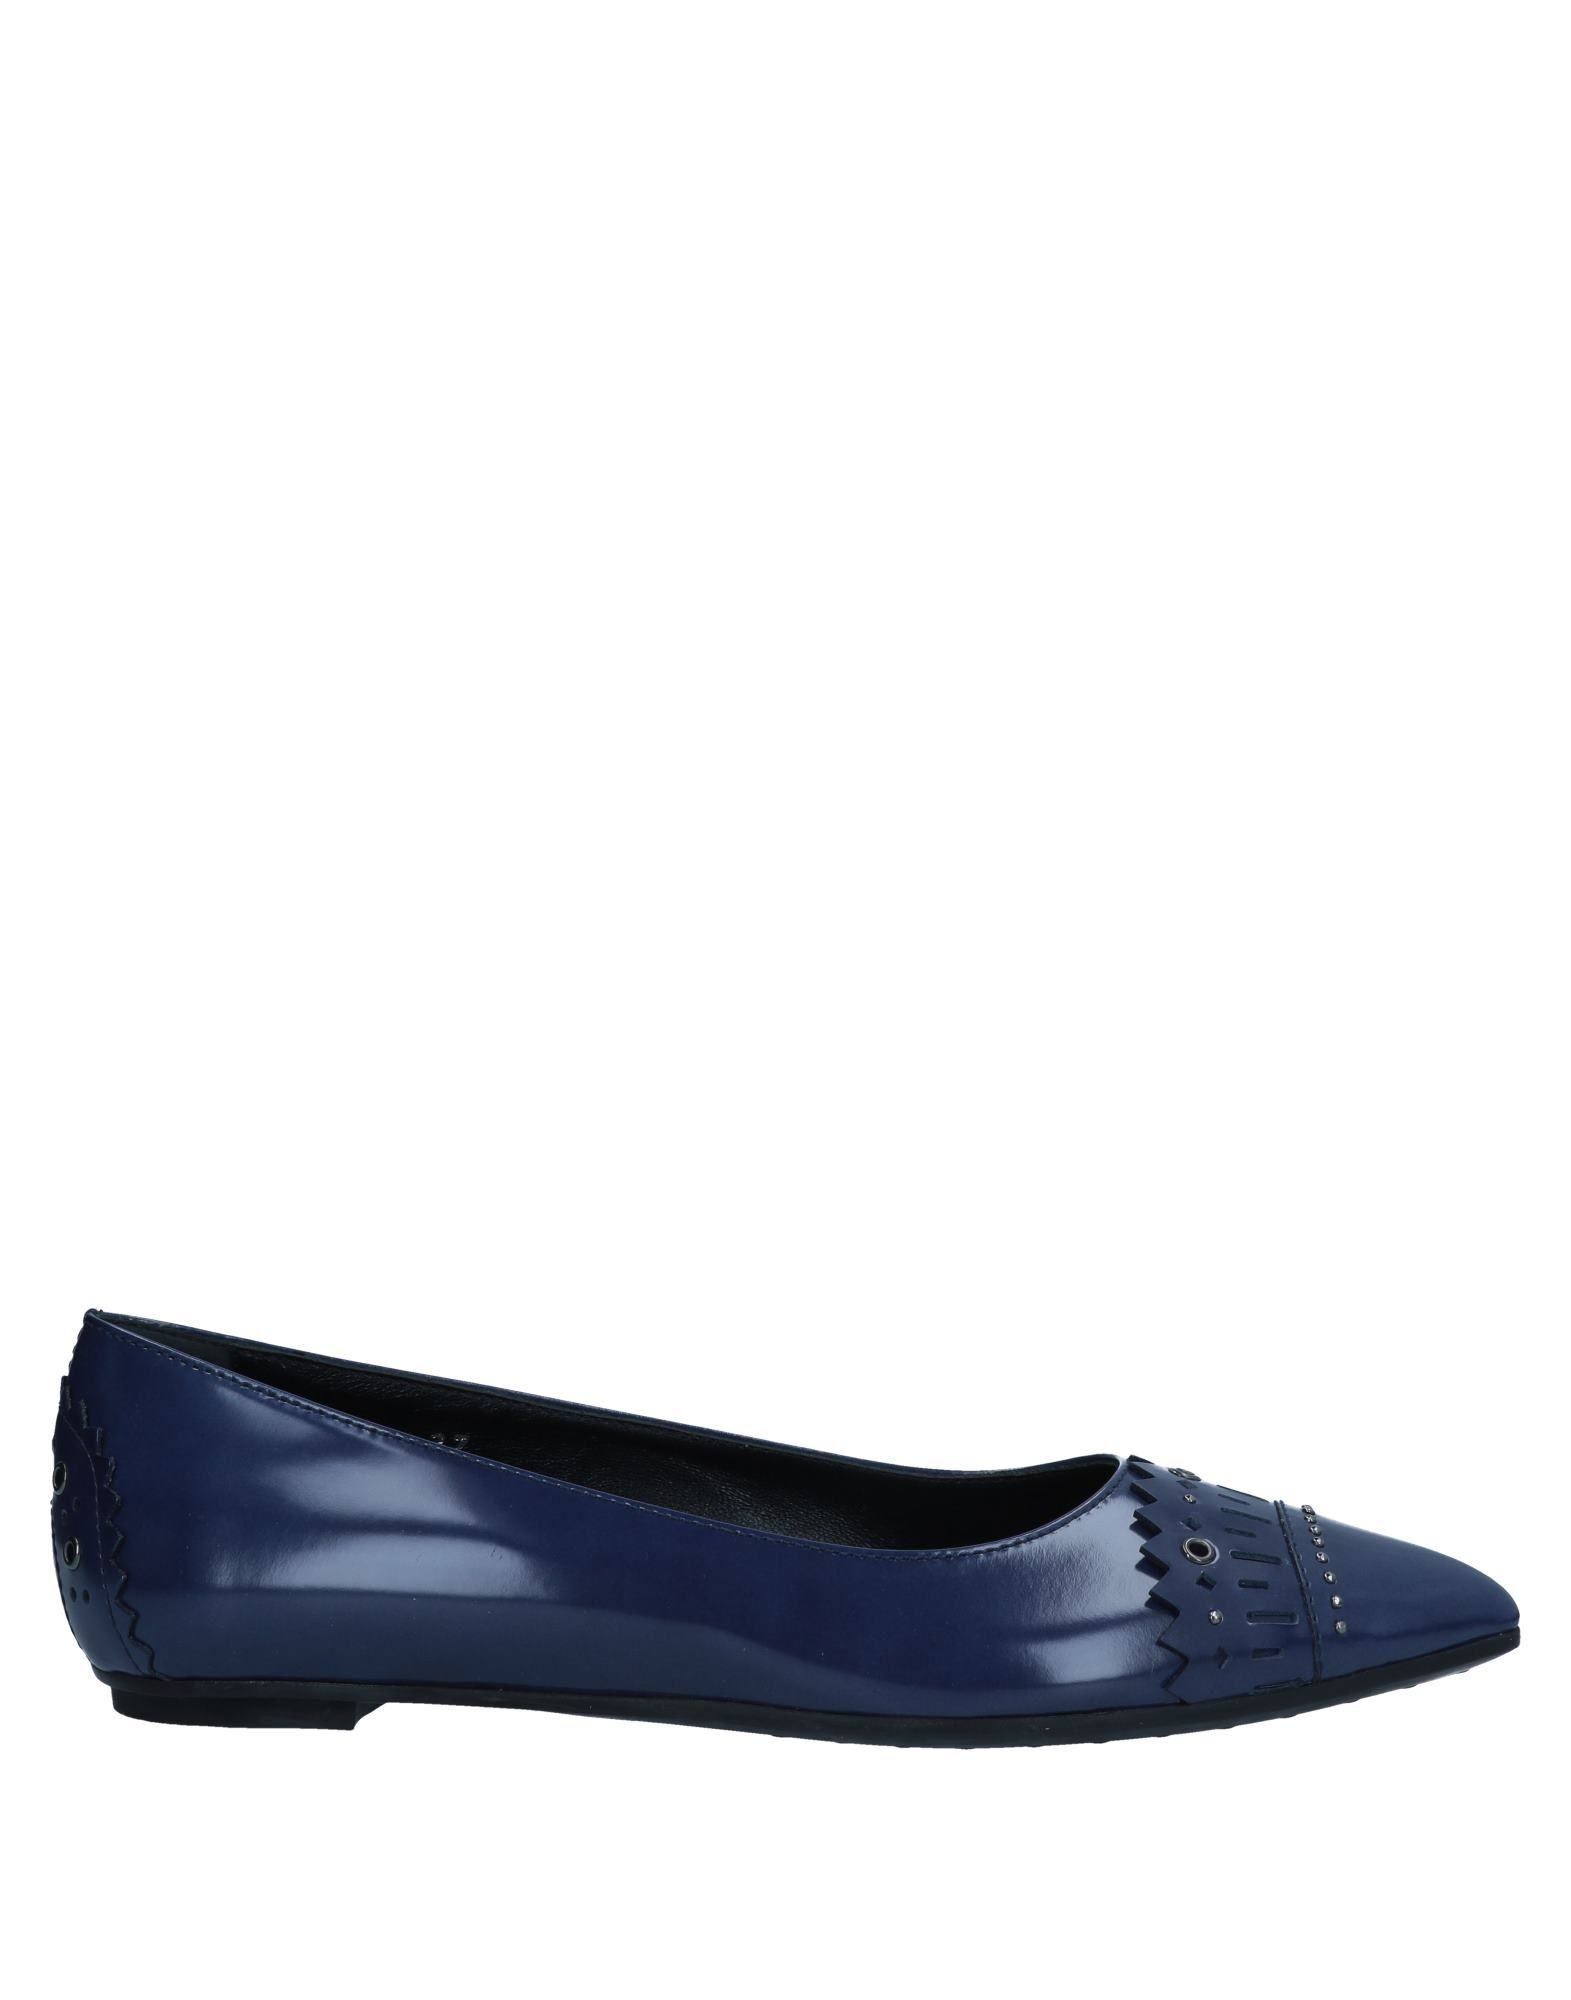 Rabatt Schuhe Tod's Ballerinas Damen  11300091SH